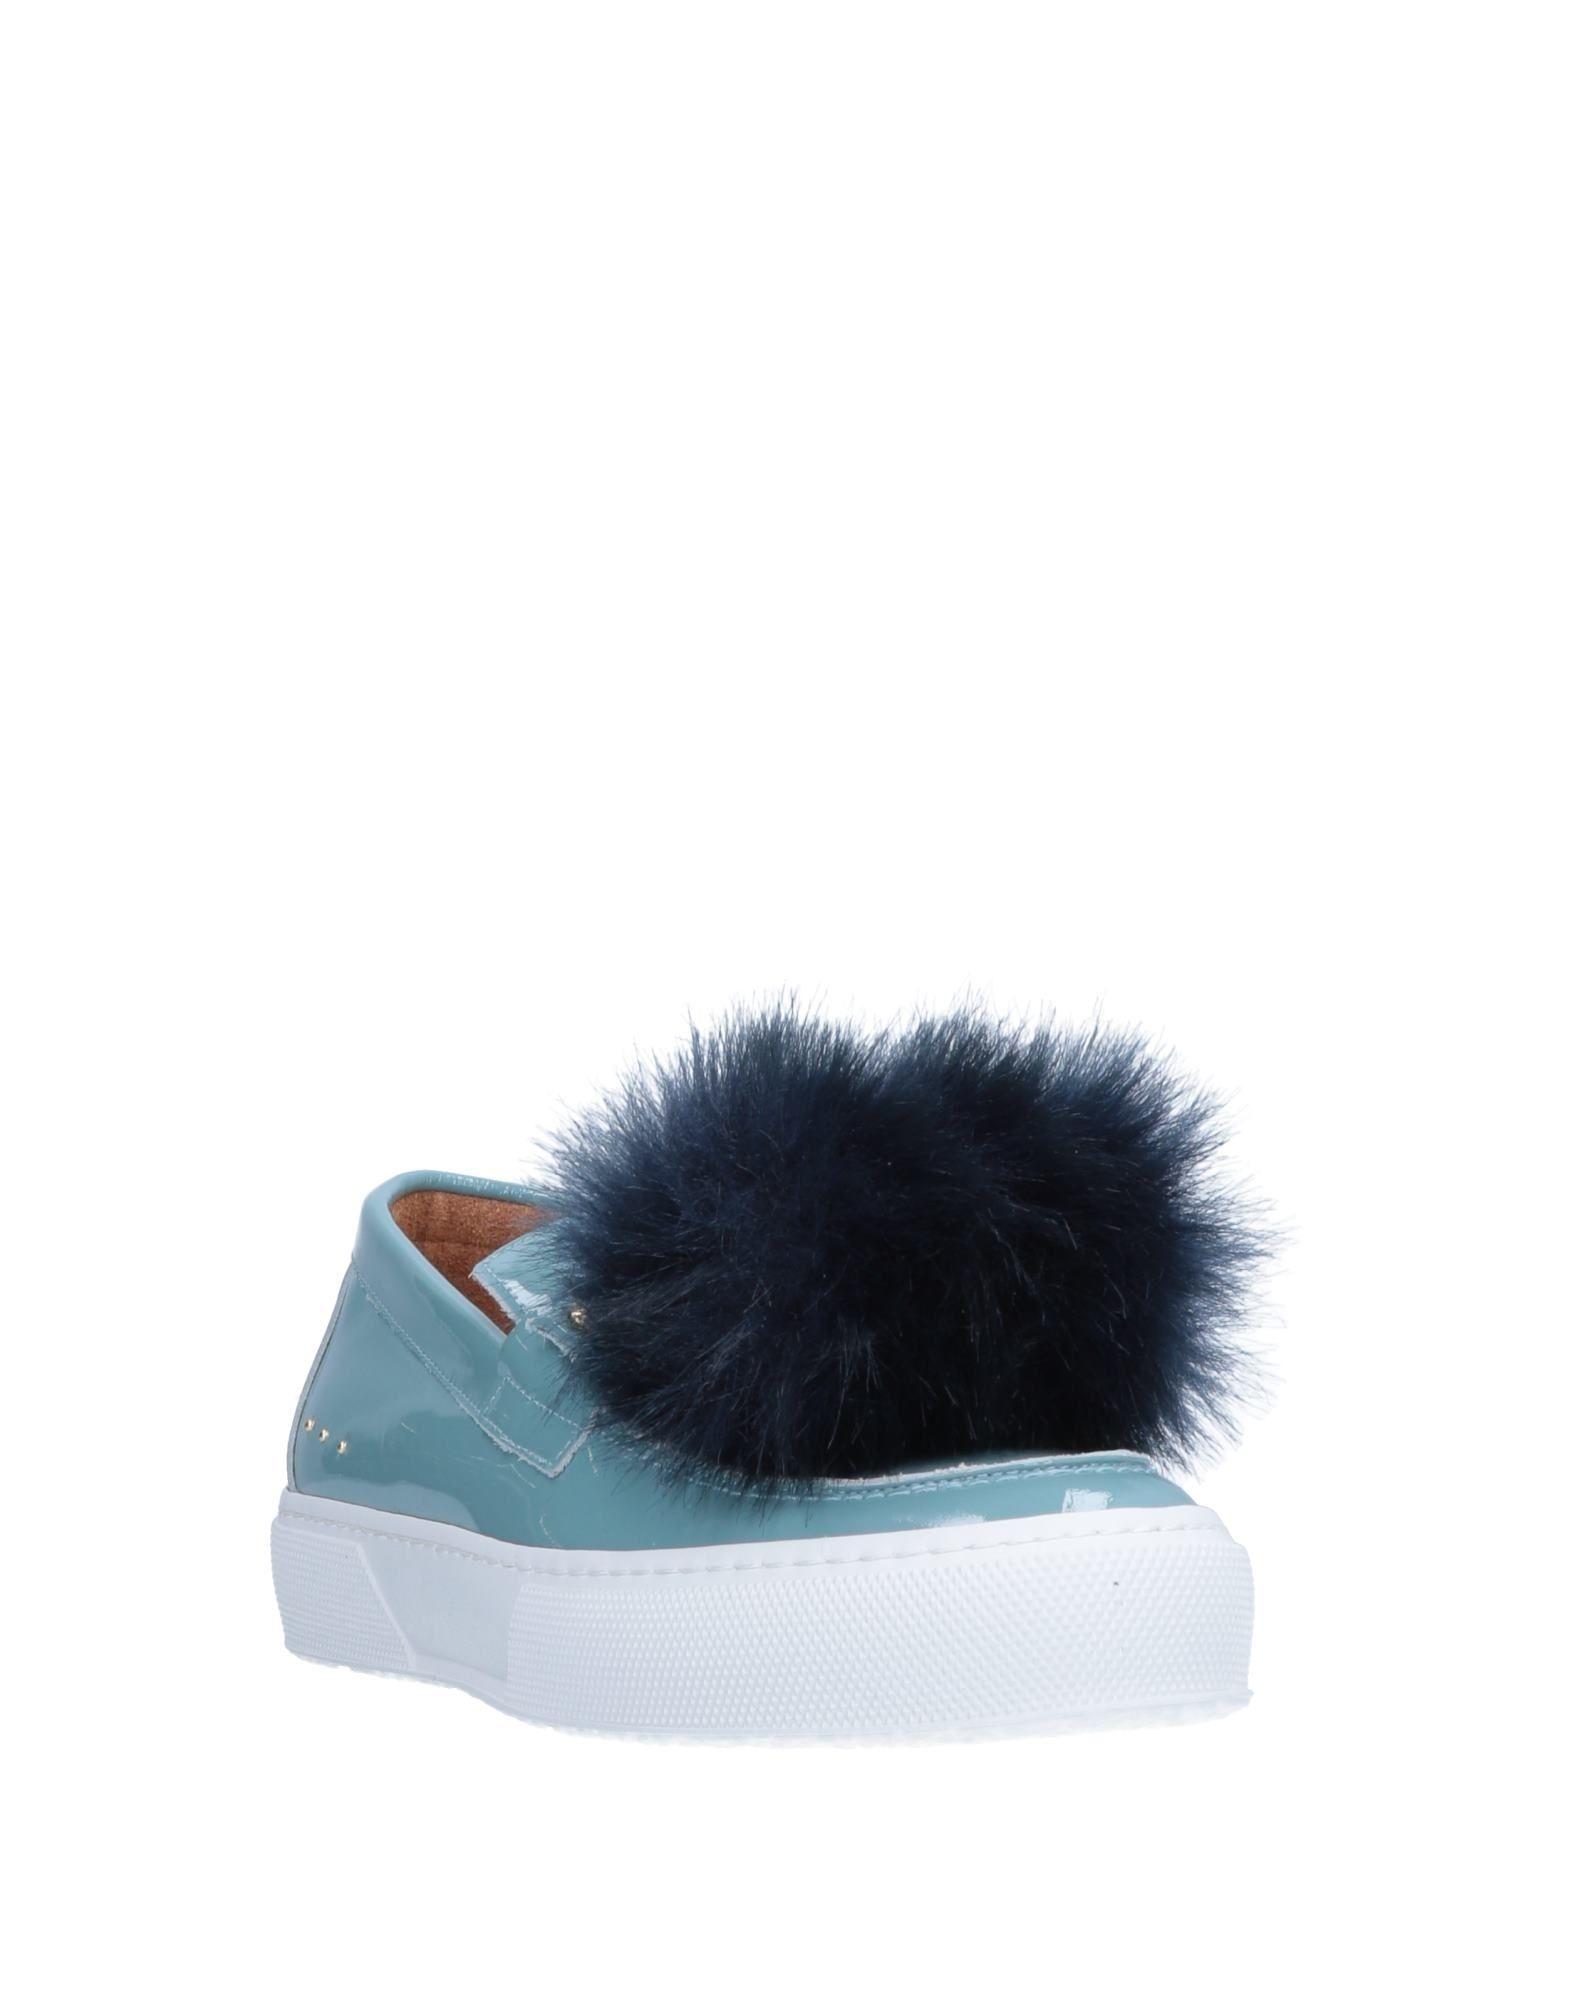 L'f Shoes 11545702LMGut Mokassins Damen  11545702LMGut Shoes aussehende strapazierfähige Schuhe caebd7